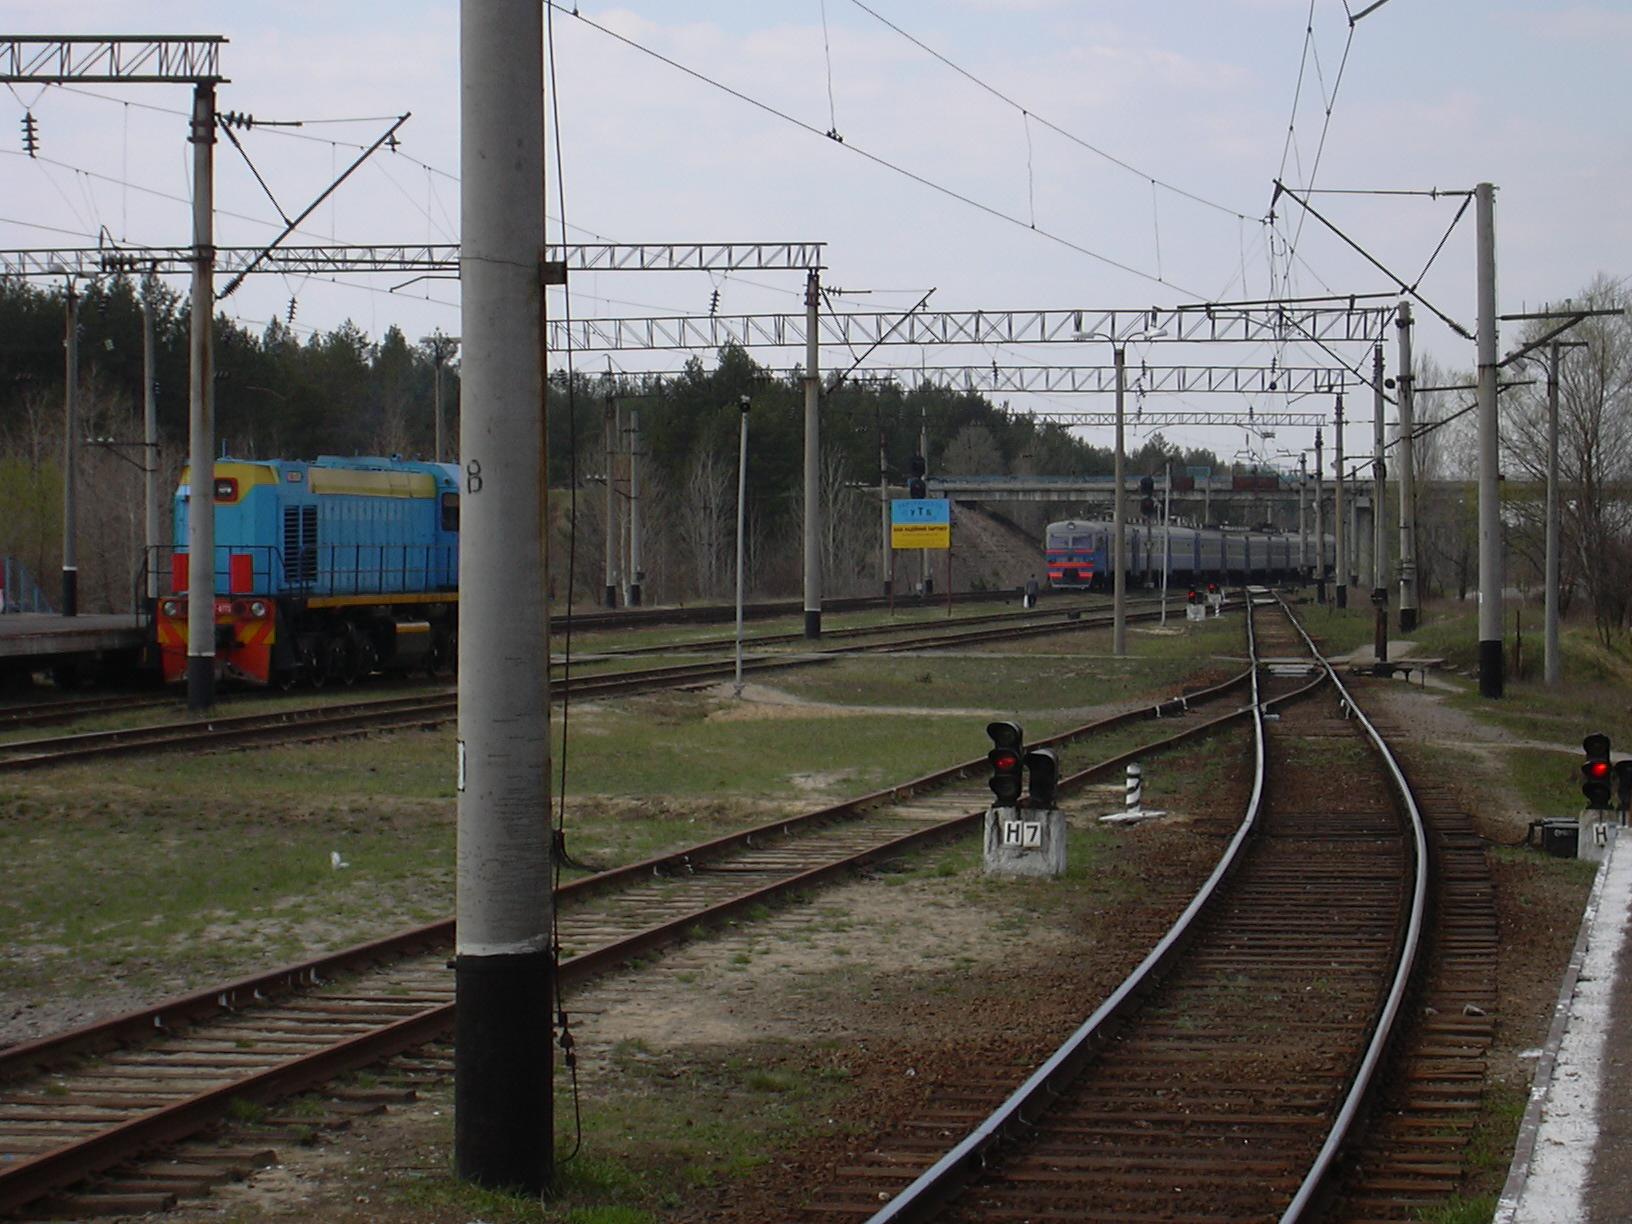 Diagram De Venn: Railway slavutych-chernobyl.jpg - Wikimedia Commons,Chart